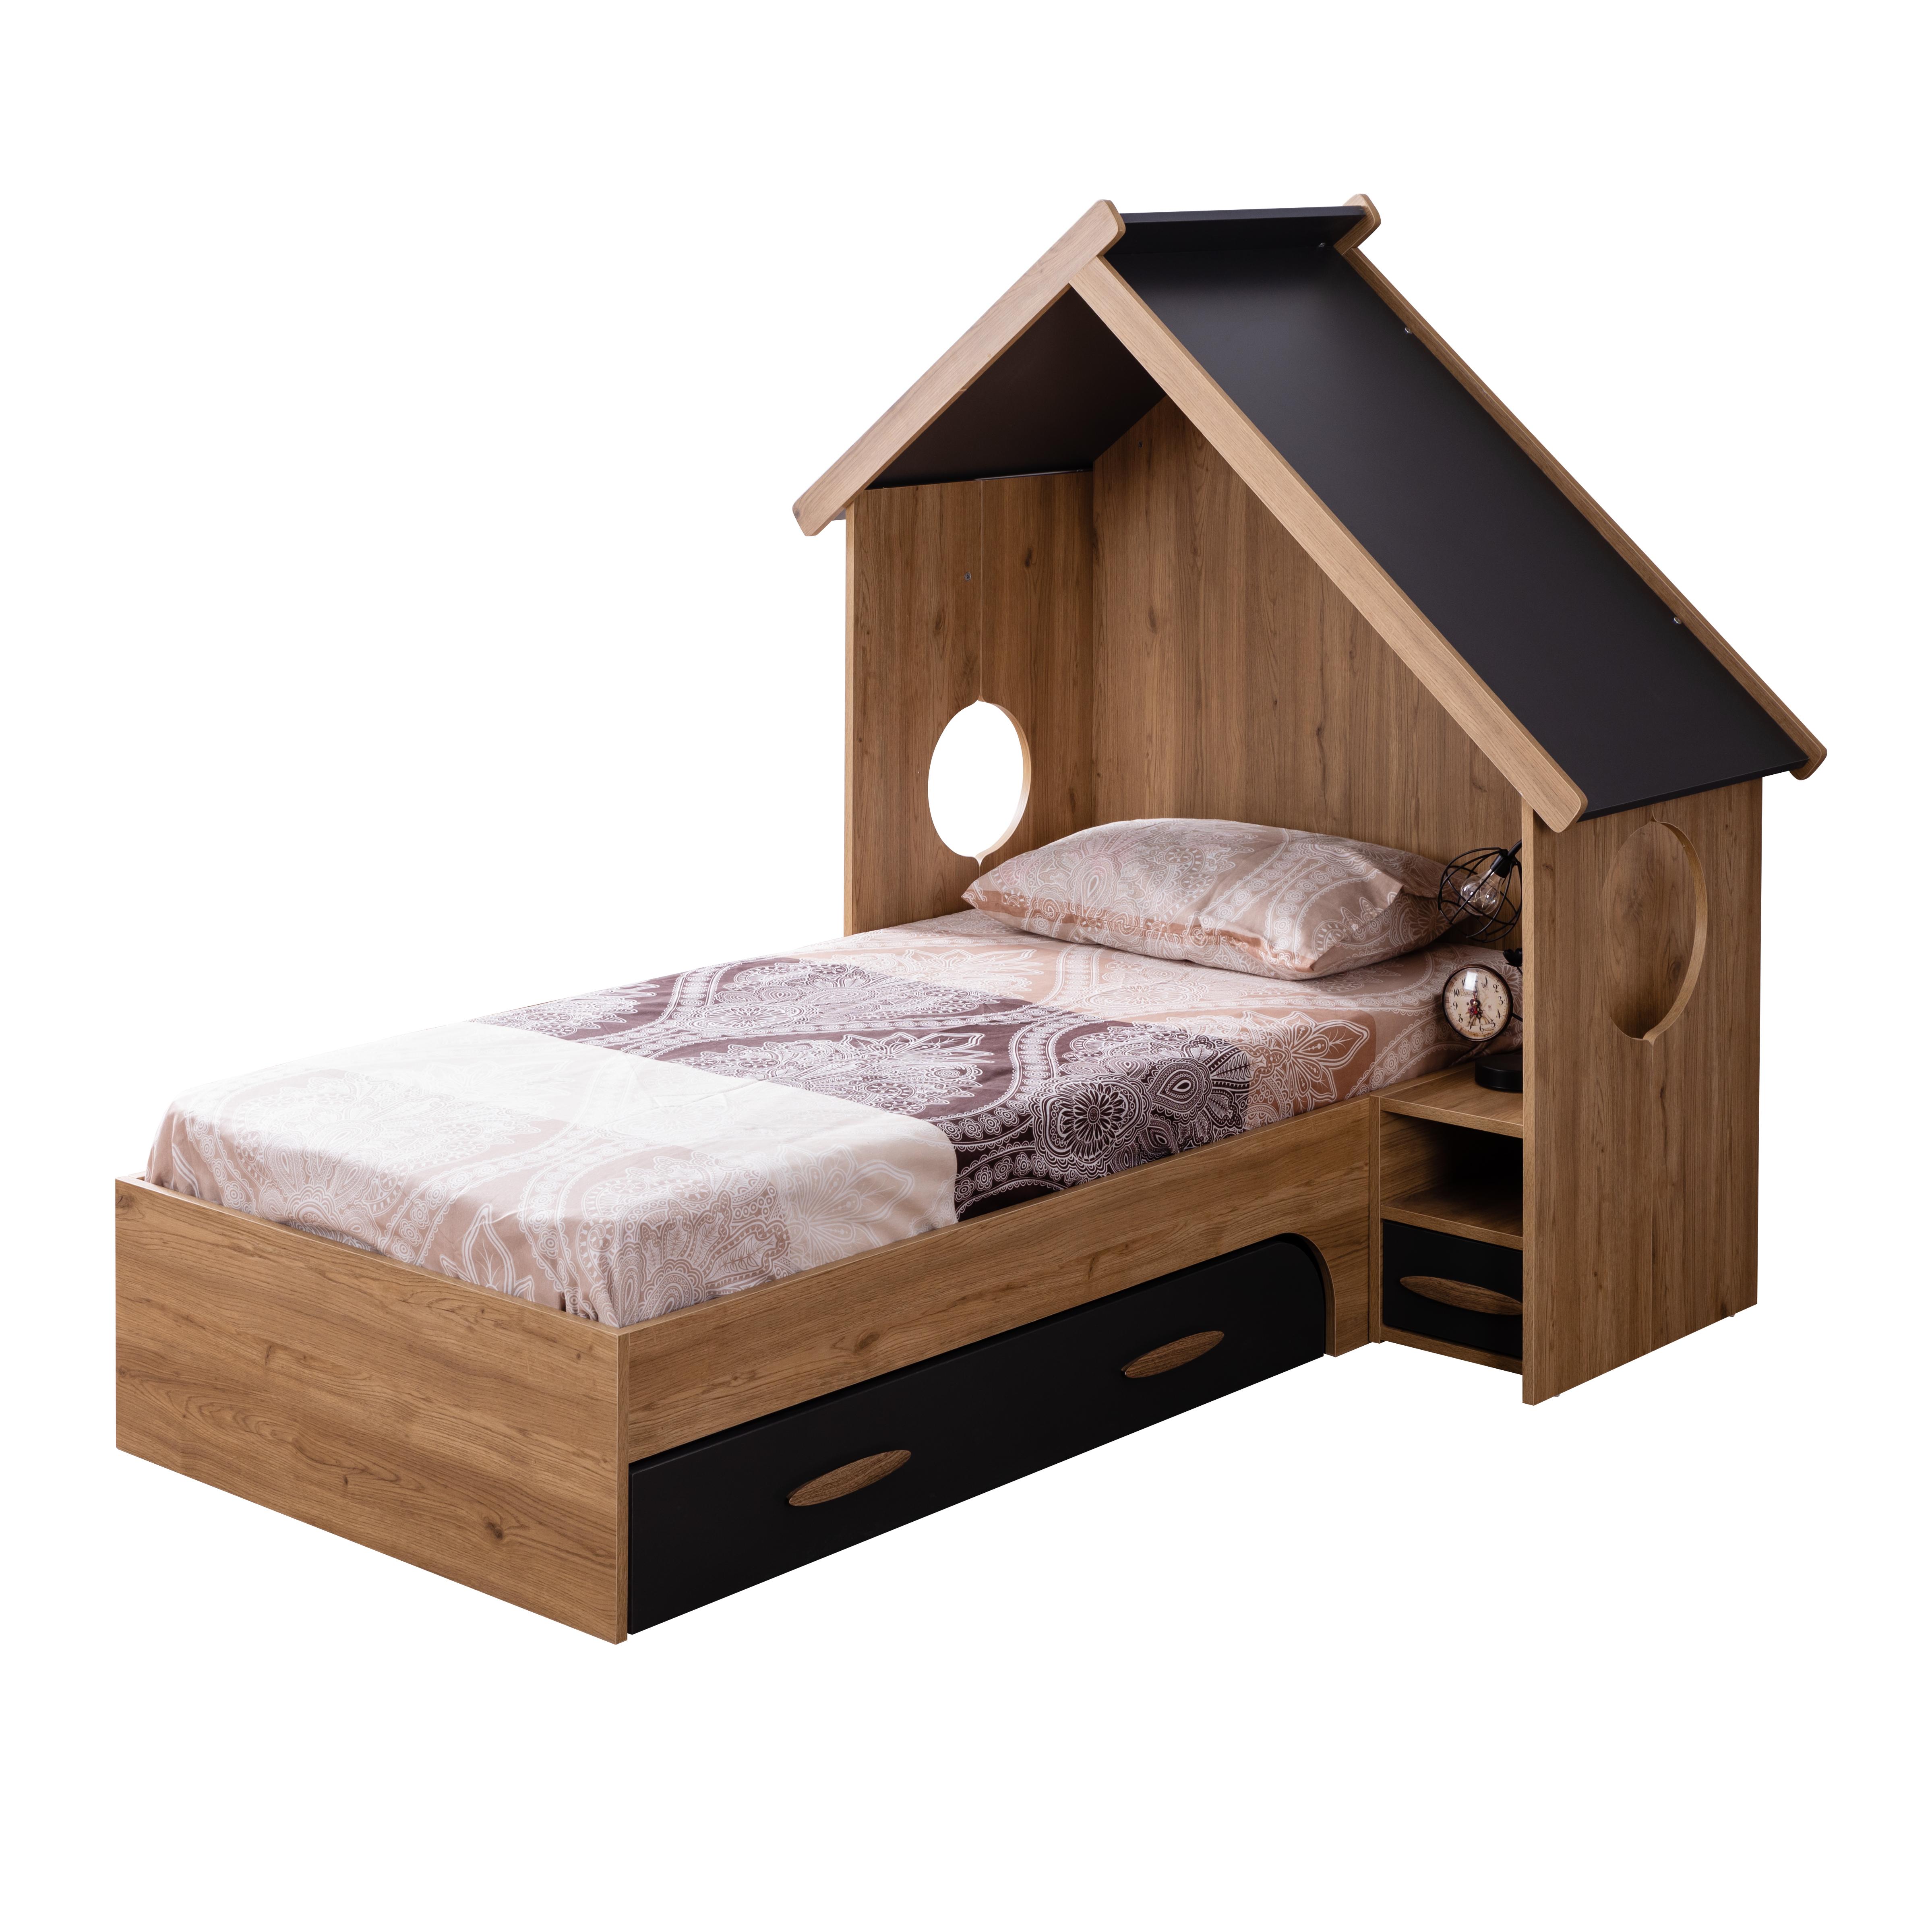 Odacix Hausbett Sultan Montessori in Vogelhausdesign